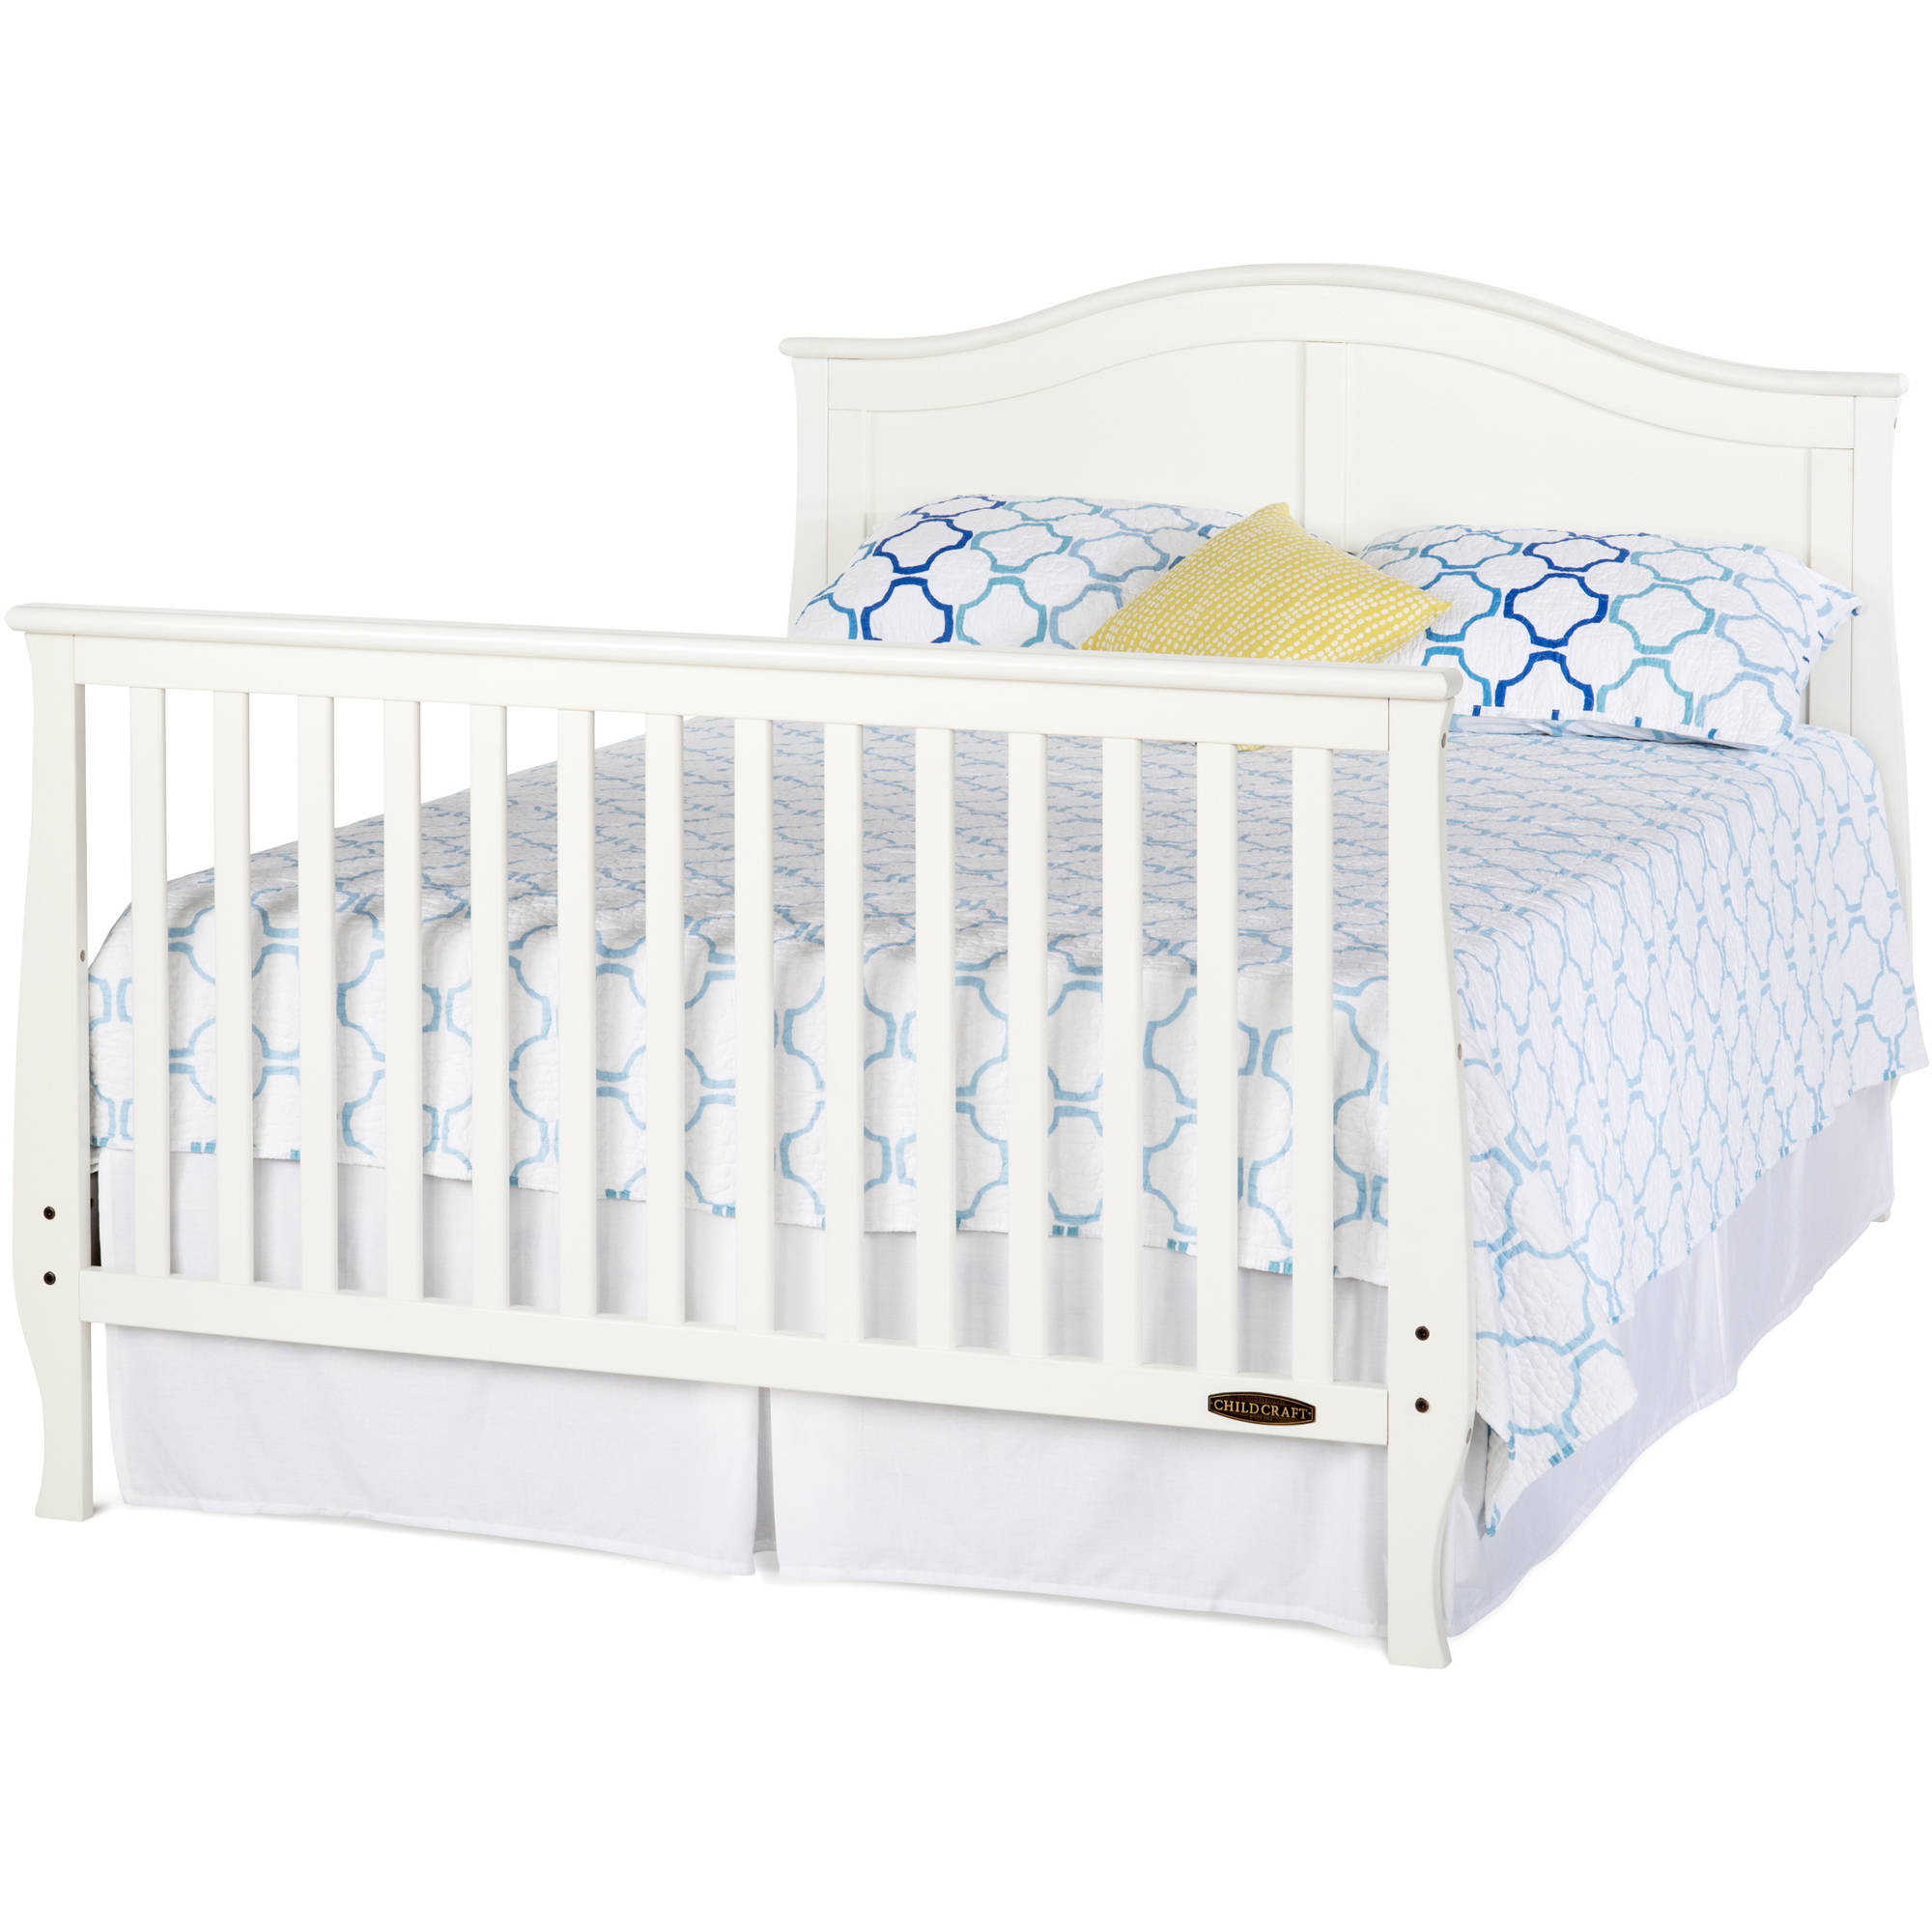 Child craft camden crib - Child Craft Camden 4 In 1 Lifetime Convertible Crib Jamocha Walmart Com